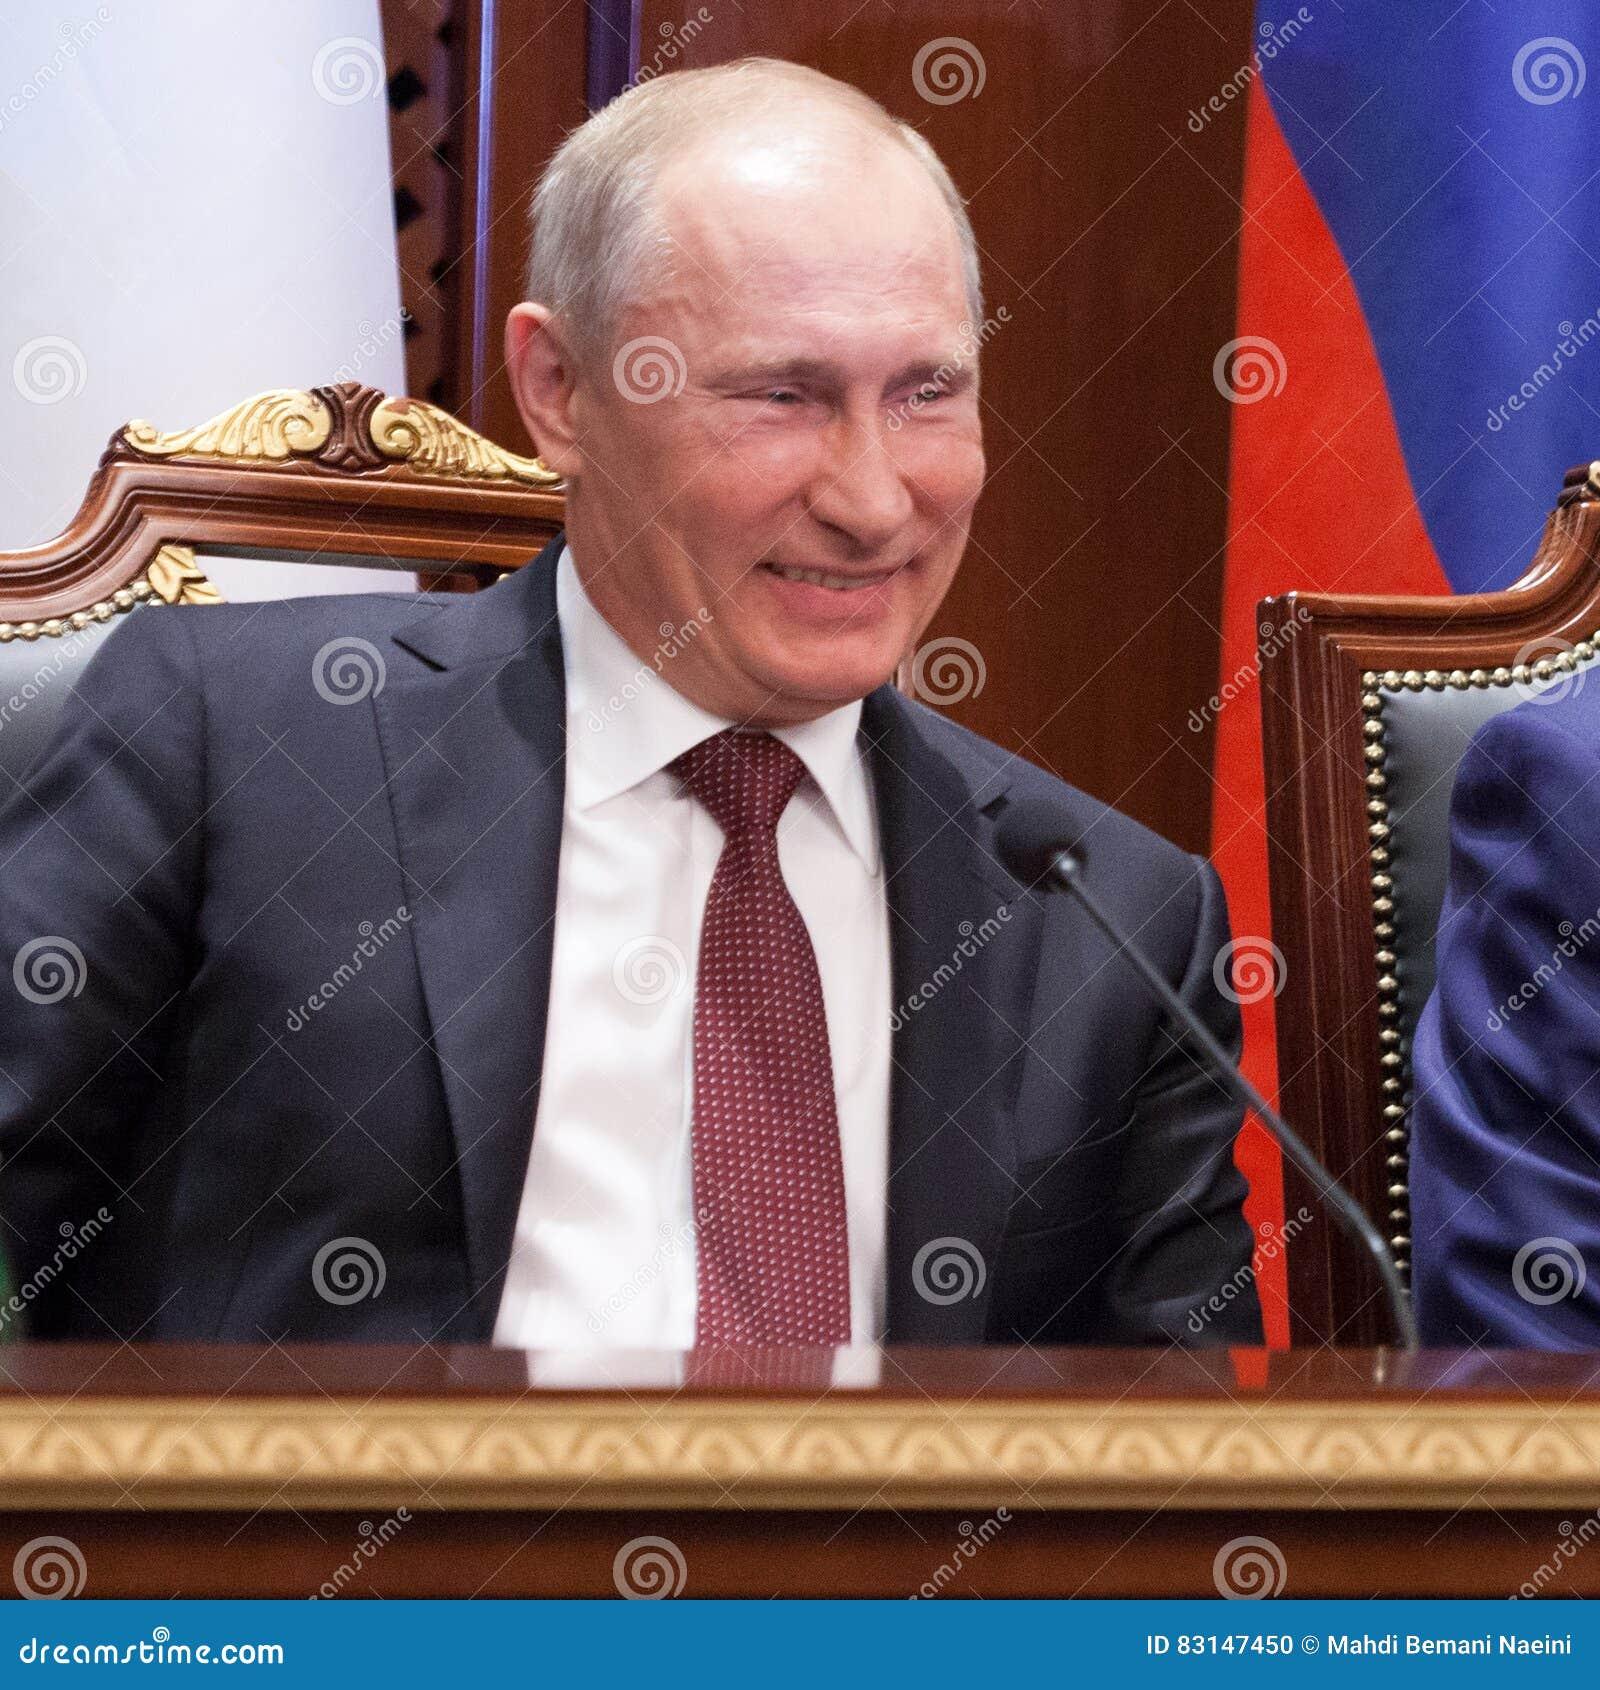 2 175 Vladimir Putin Photos Free Royalty Free Stock Photos From Dreamstime